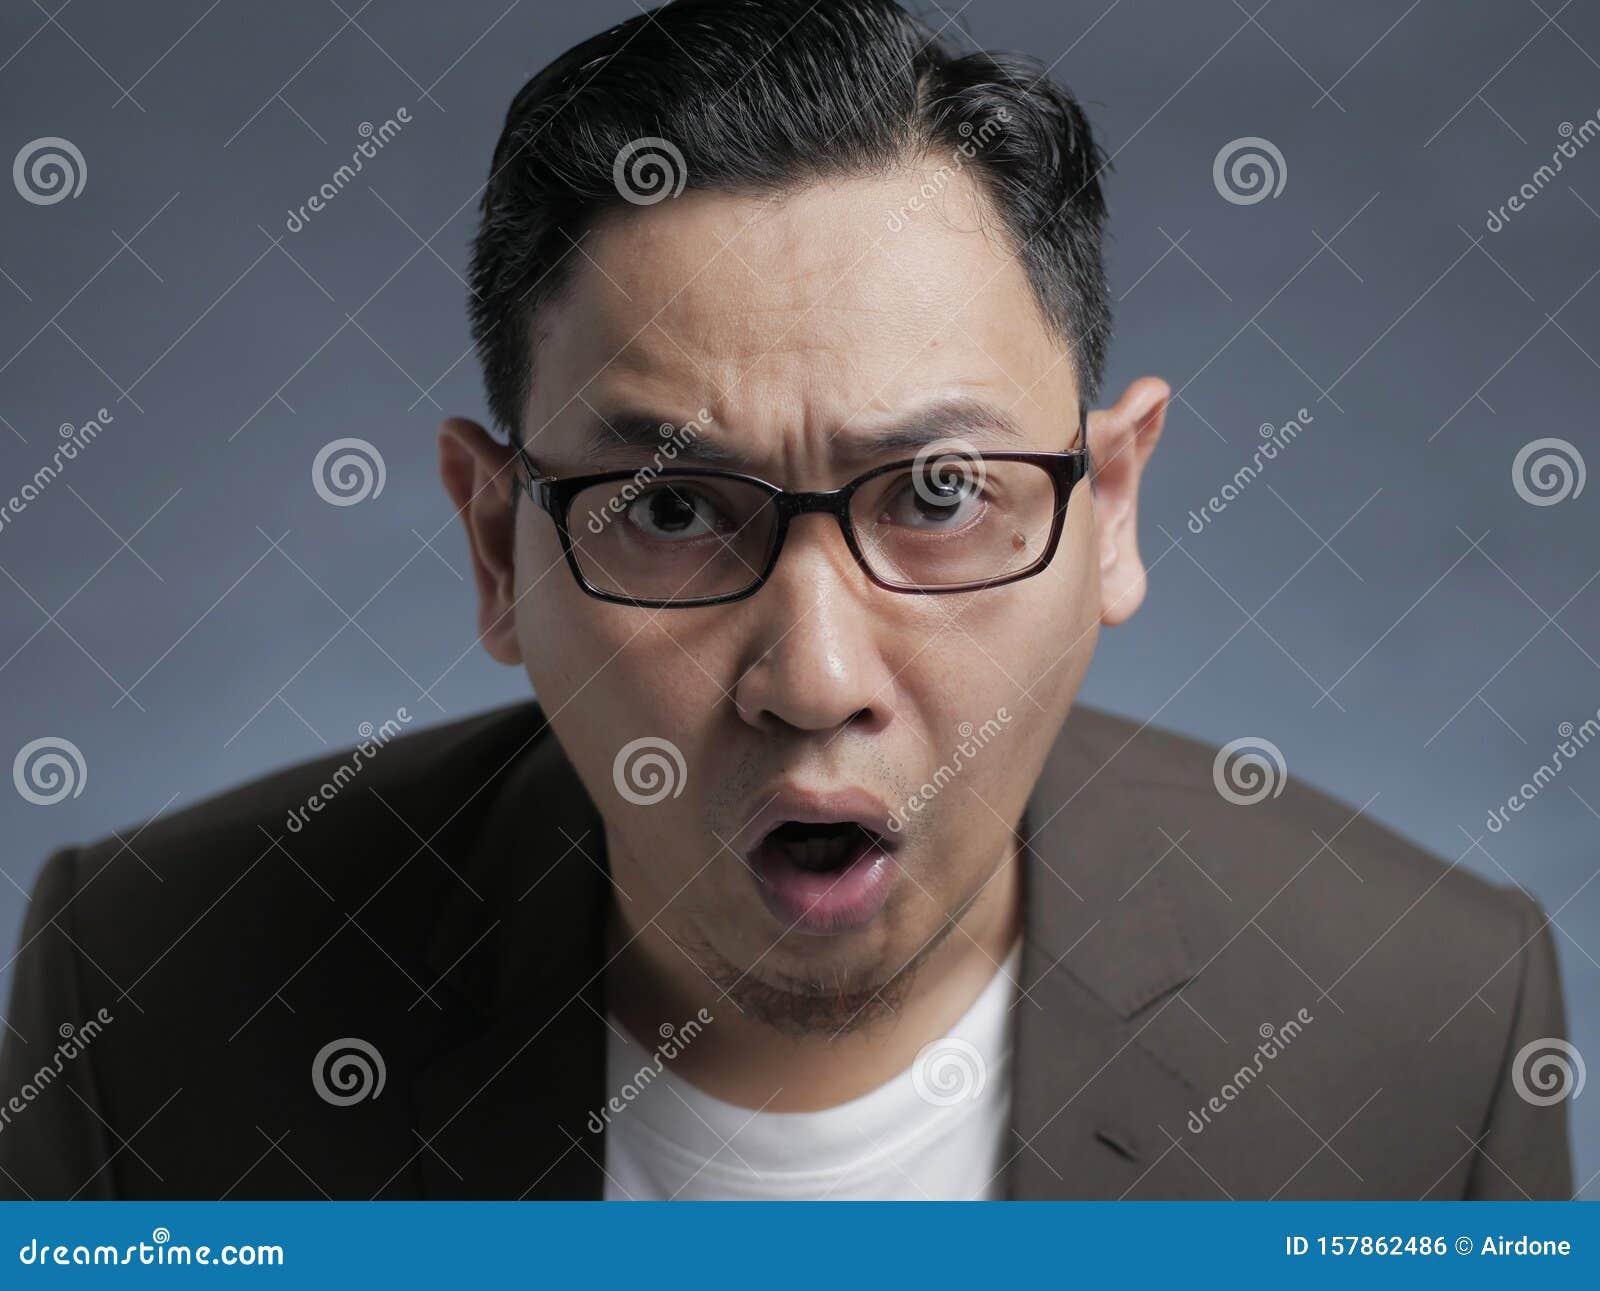 Businessman Shocked Surprised Expression